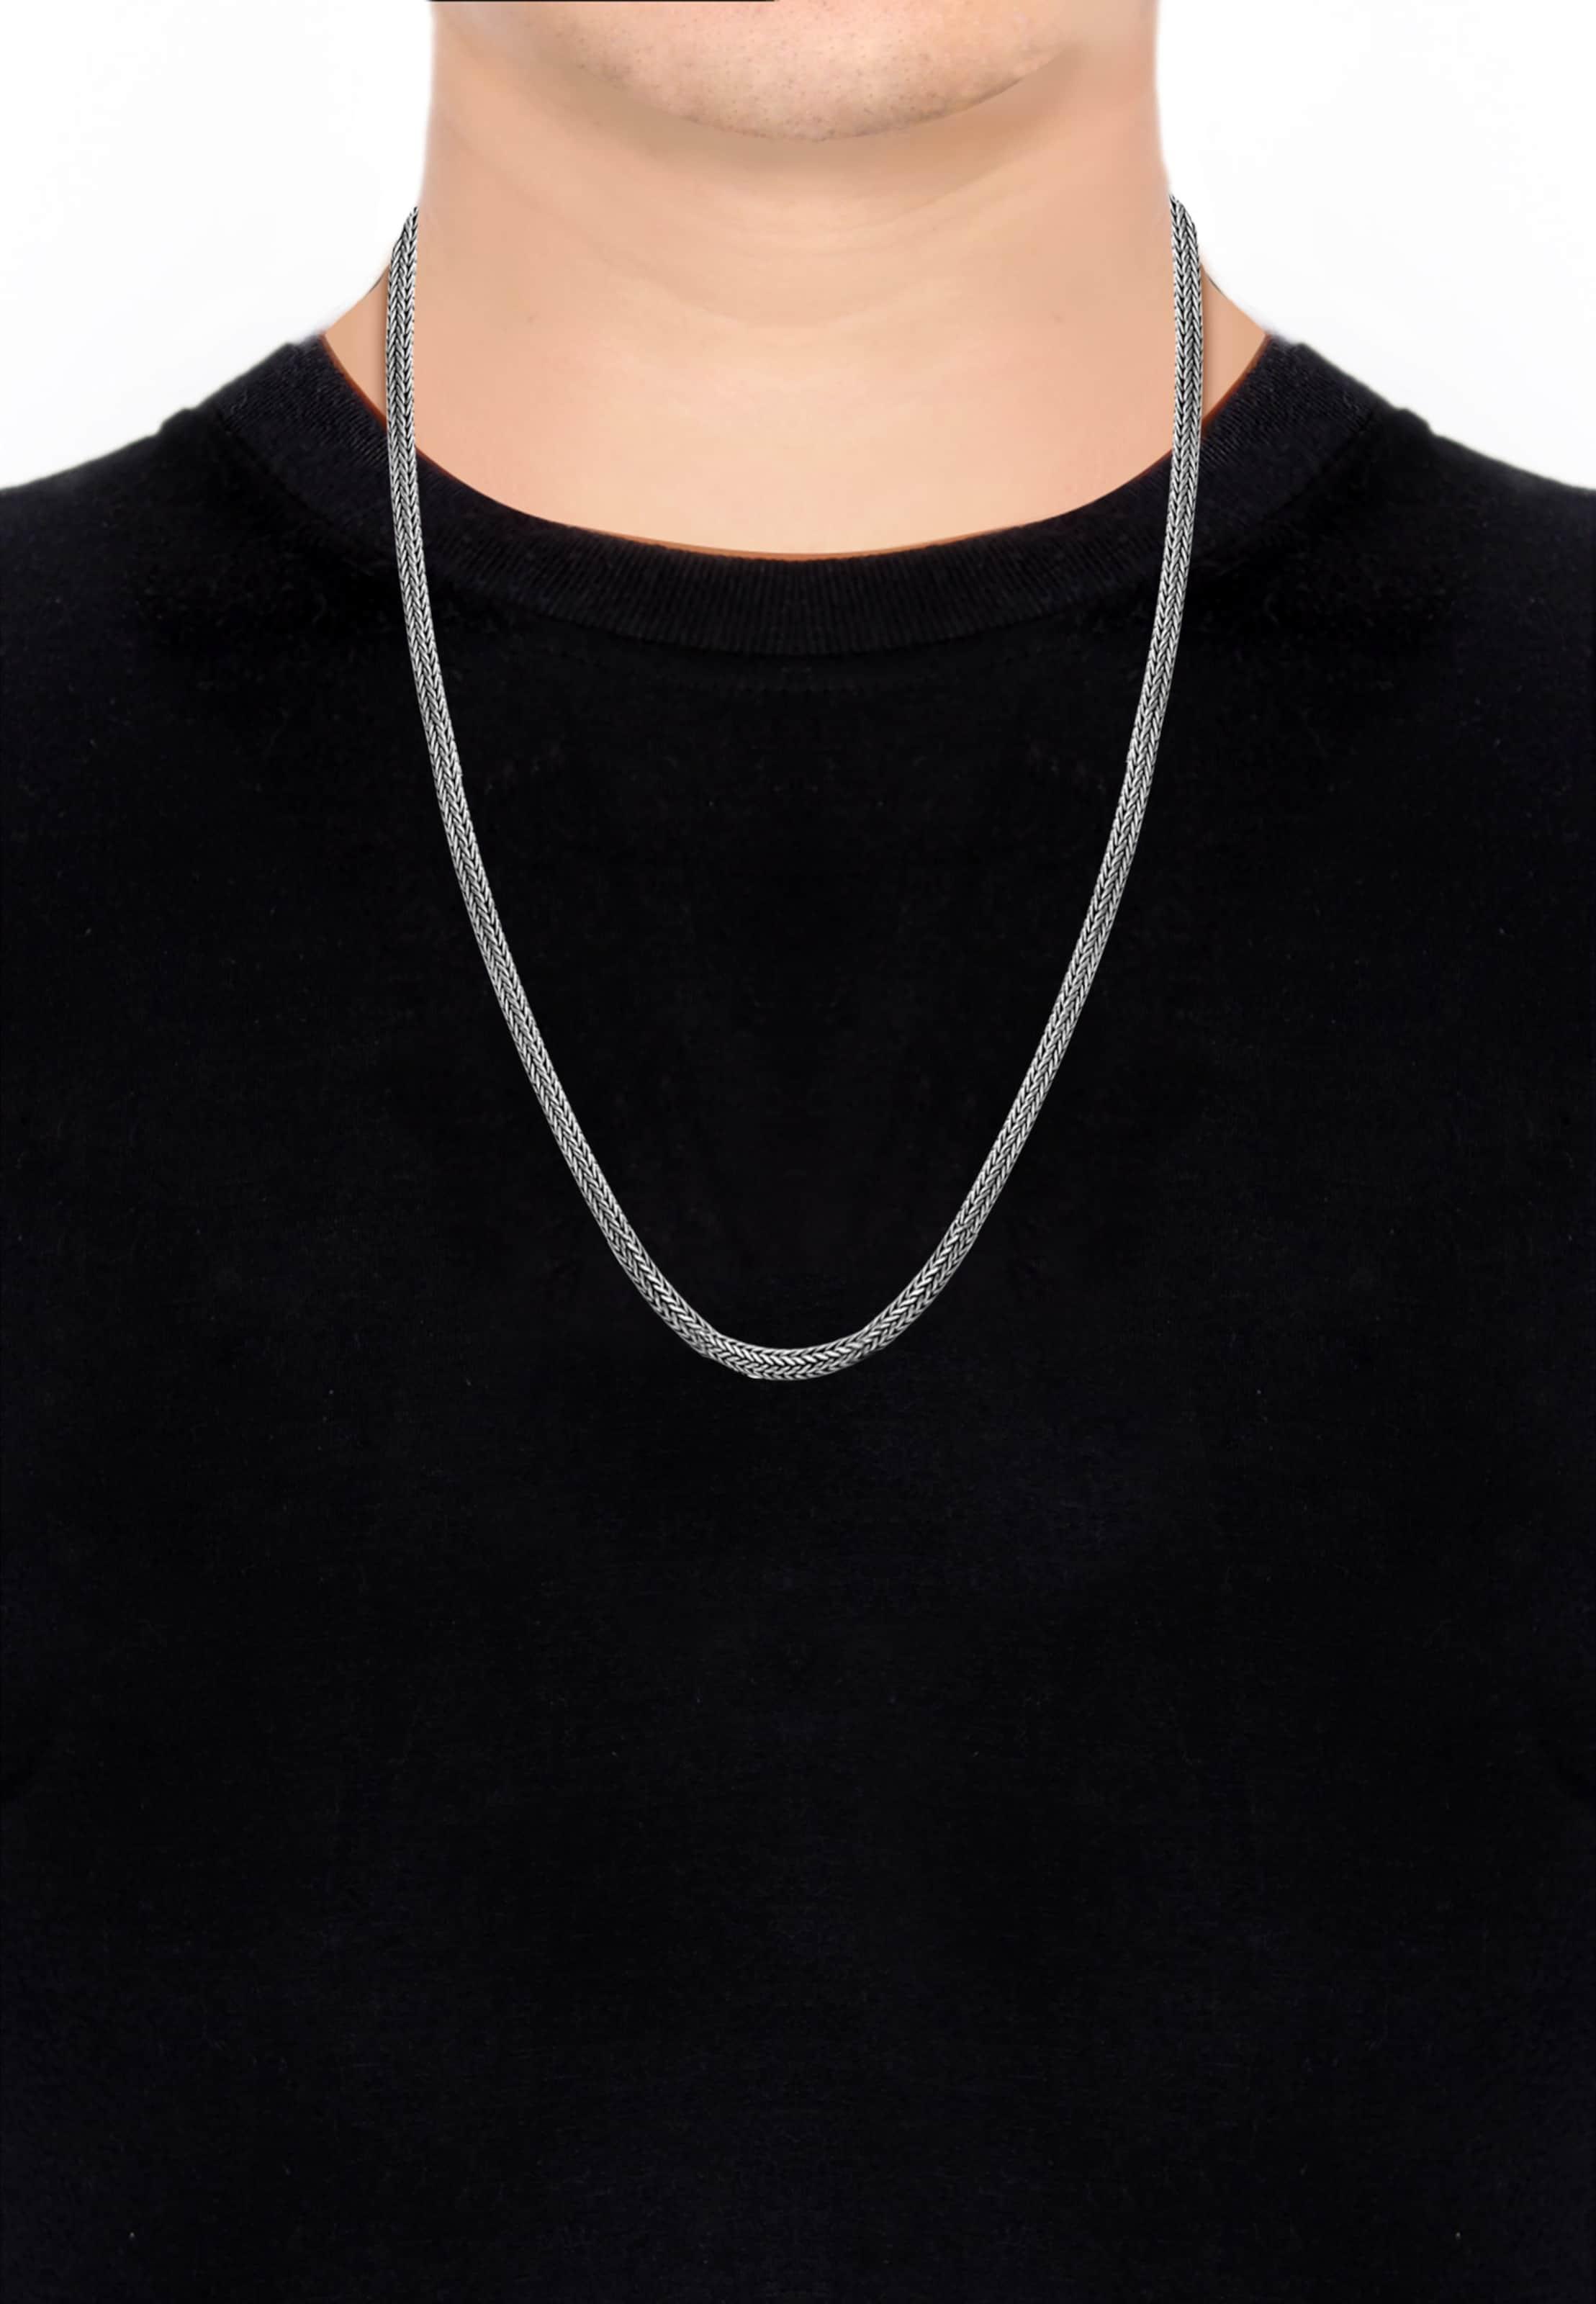 In In Halskette Silber Silber Halskette Kuzzoi Kuzzoi nw0O8kP